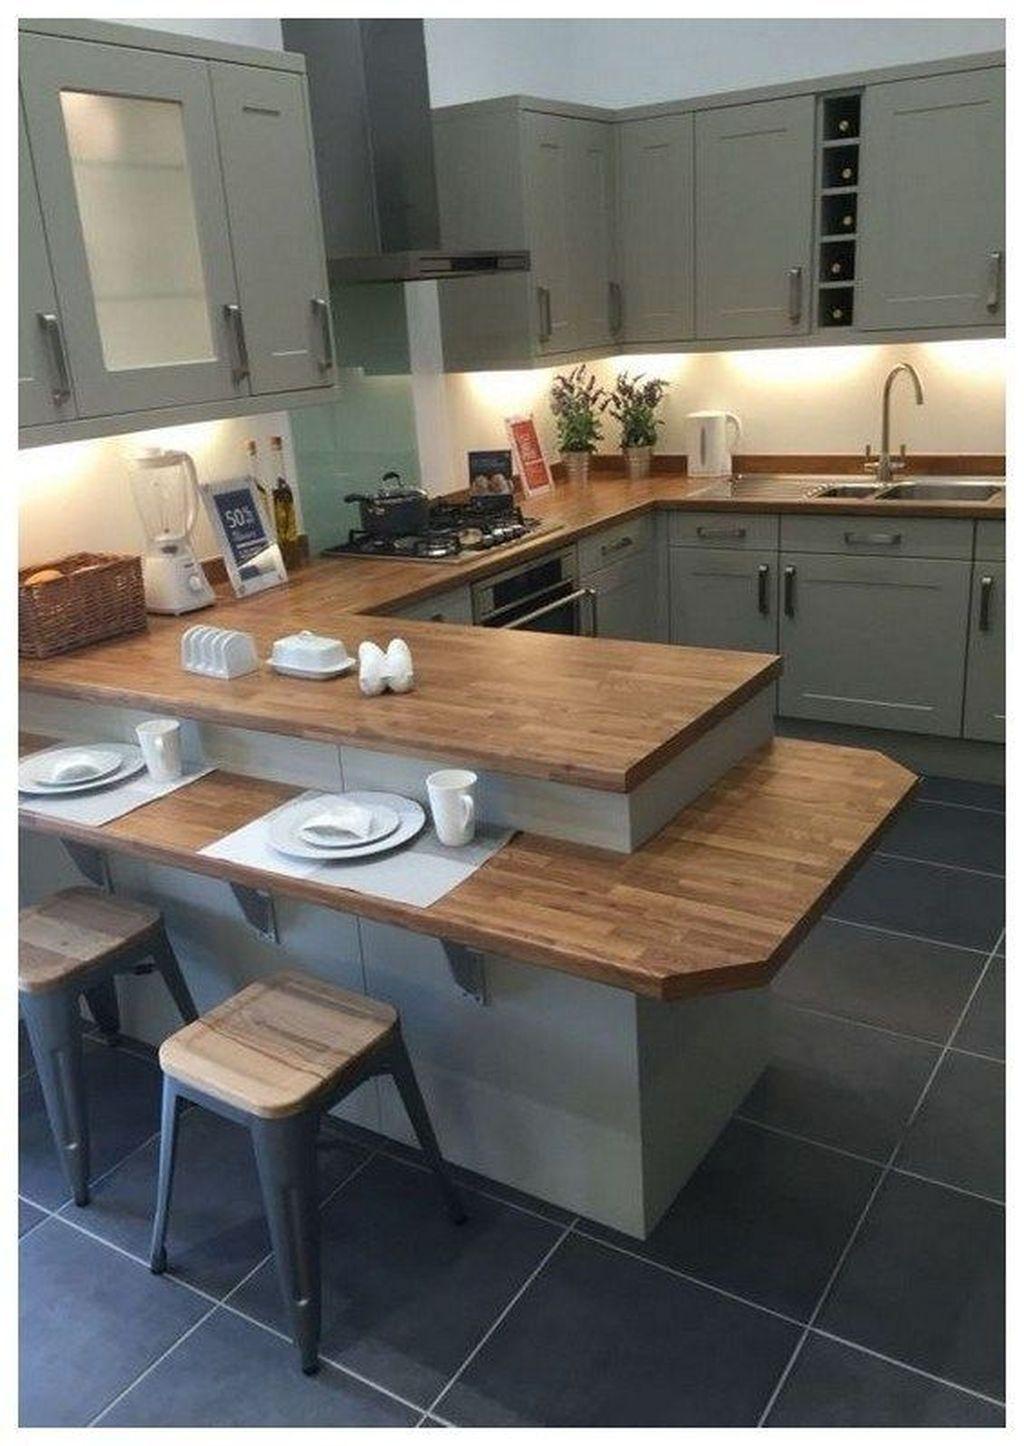 39 Cool Kitchen Design Ideas With Temporary Looks Kitchen